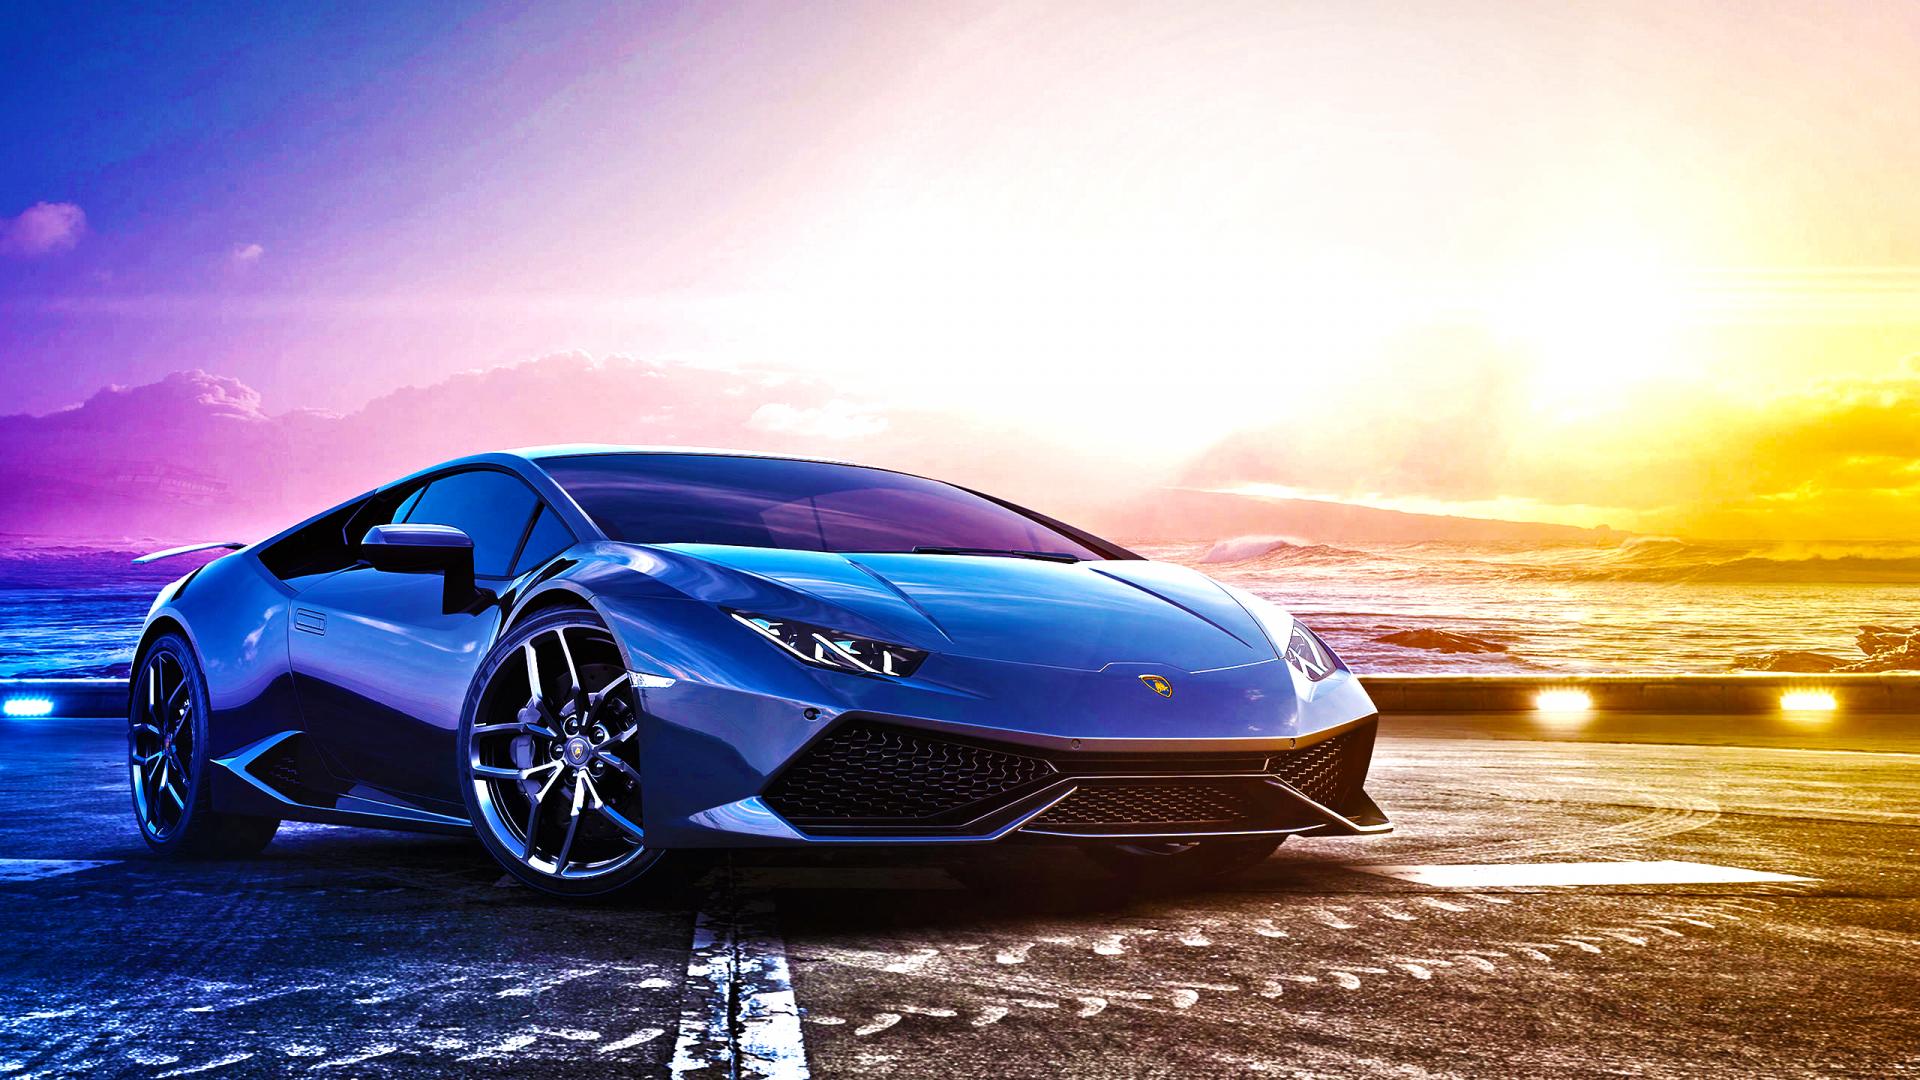 Desktop Wallpaper Lamborghini Blue Sports Car, Hd Image, Picture, Background, Qp7u06